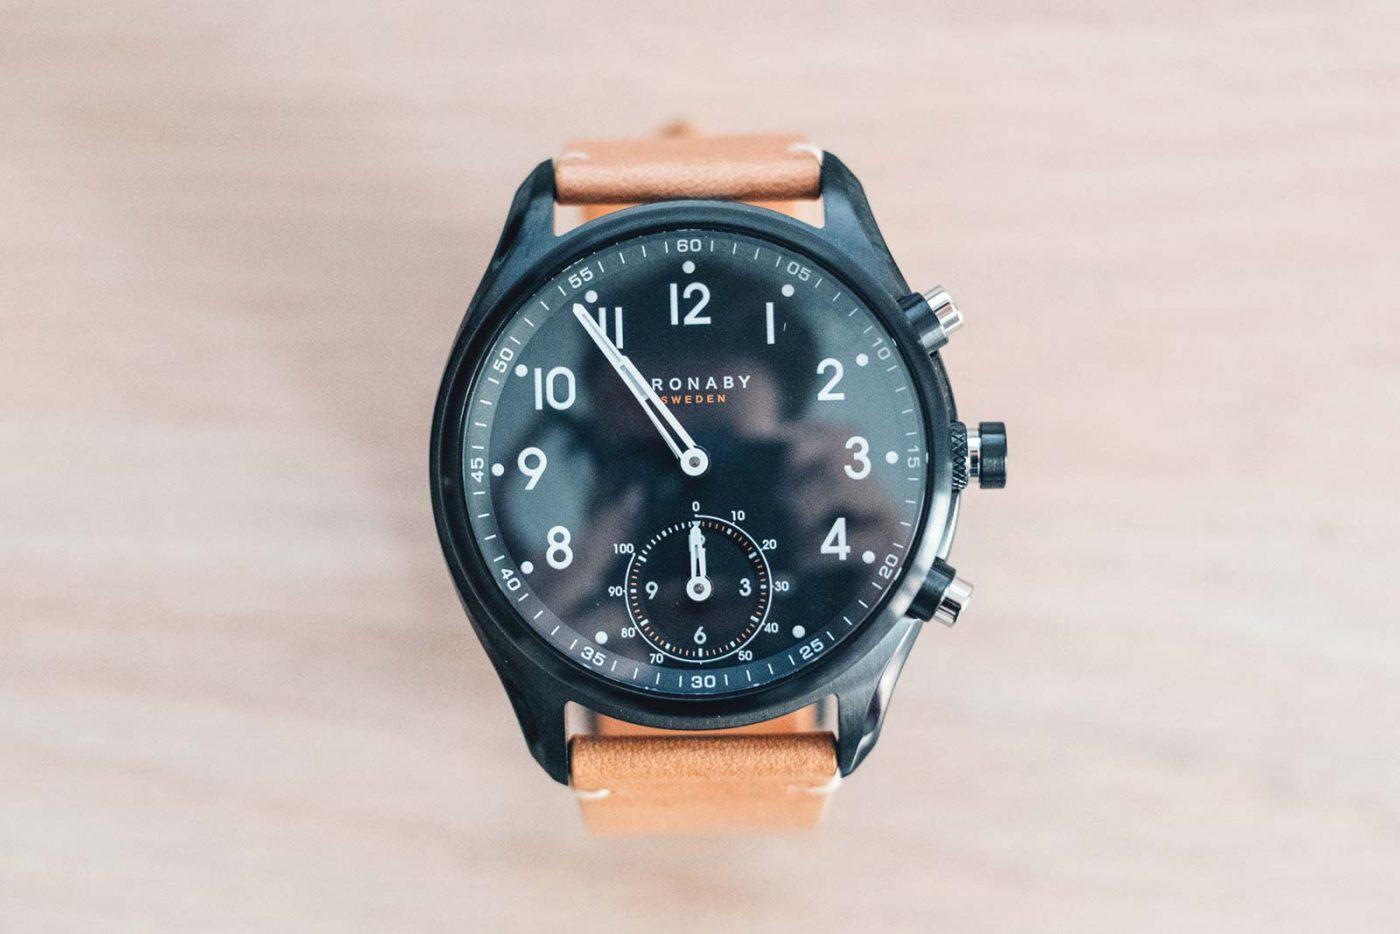 Kronaby : l'horlogerie connectée made in Sweden